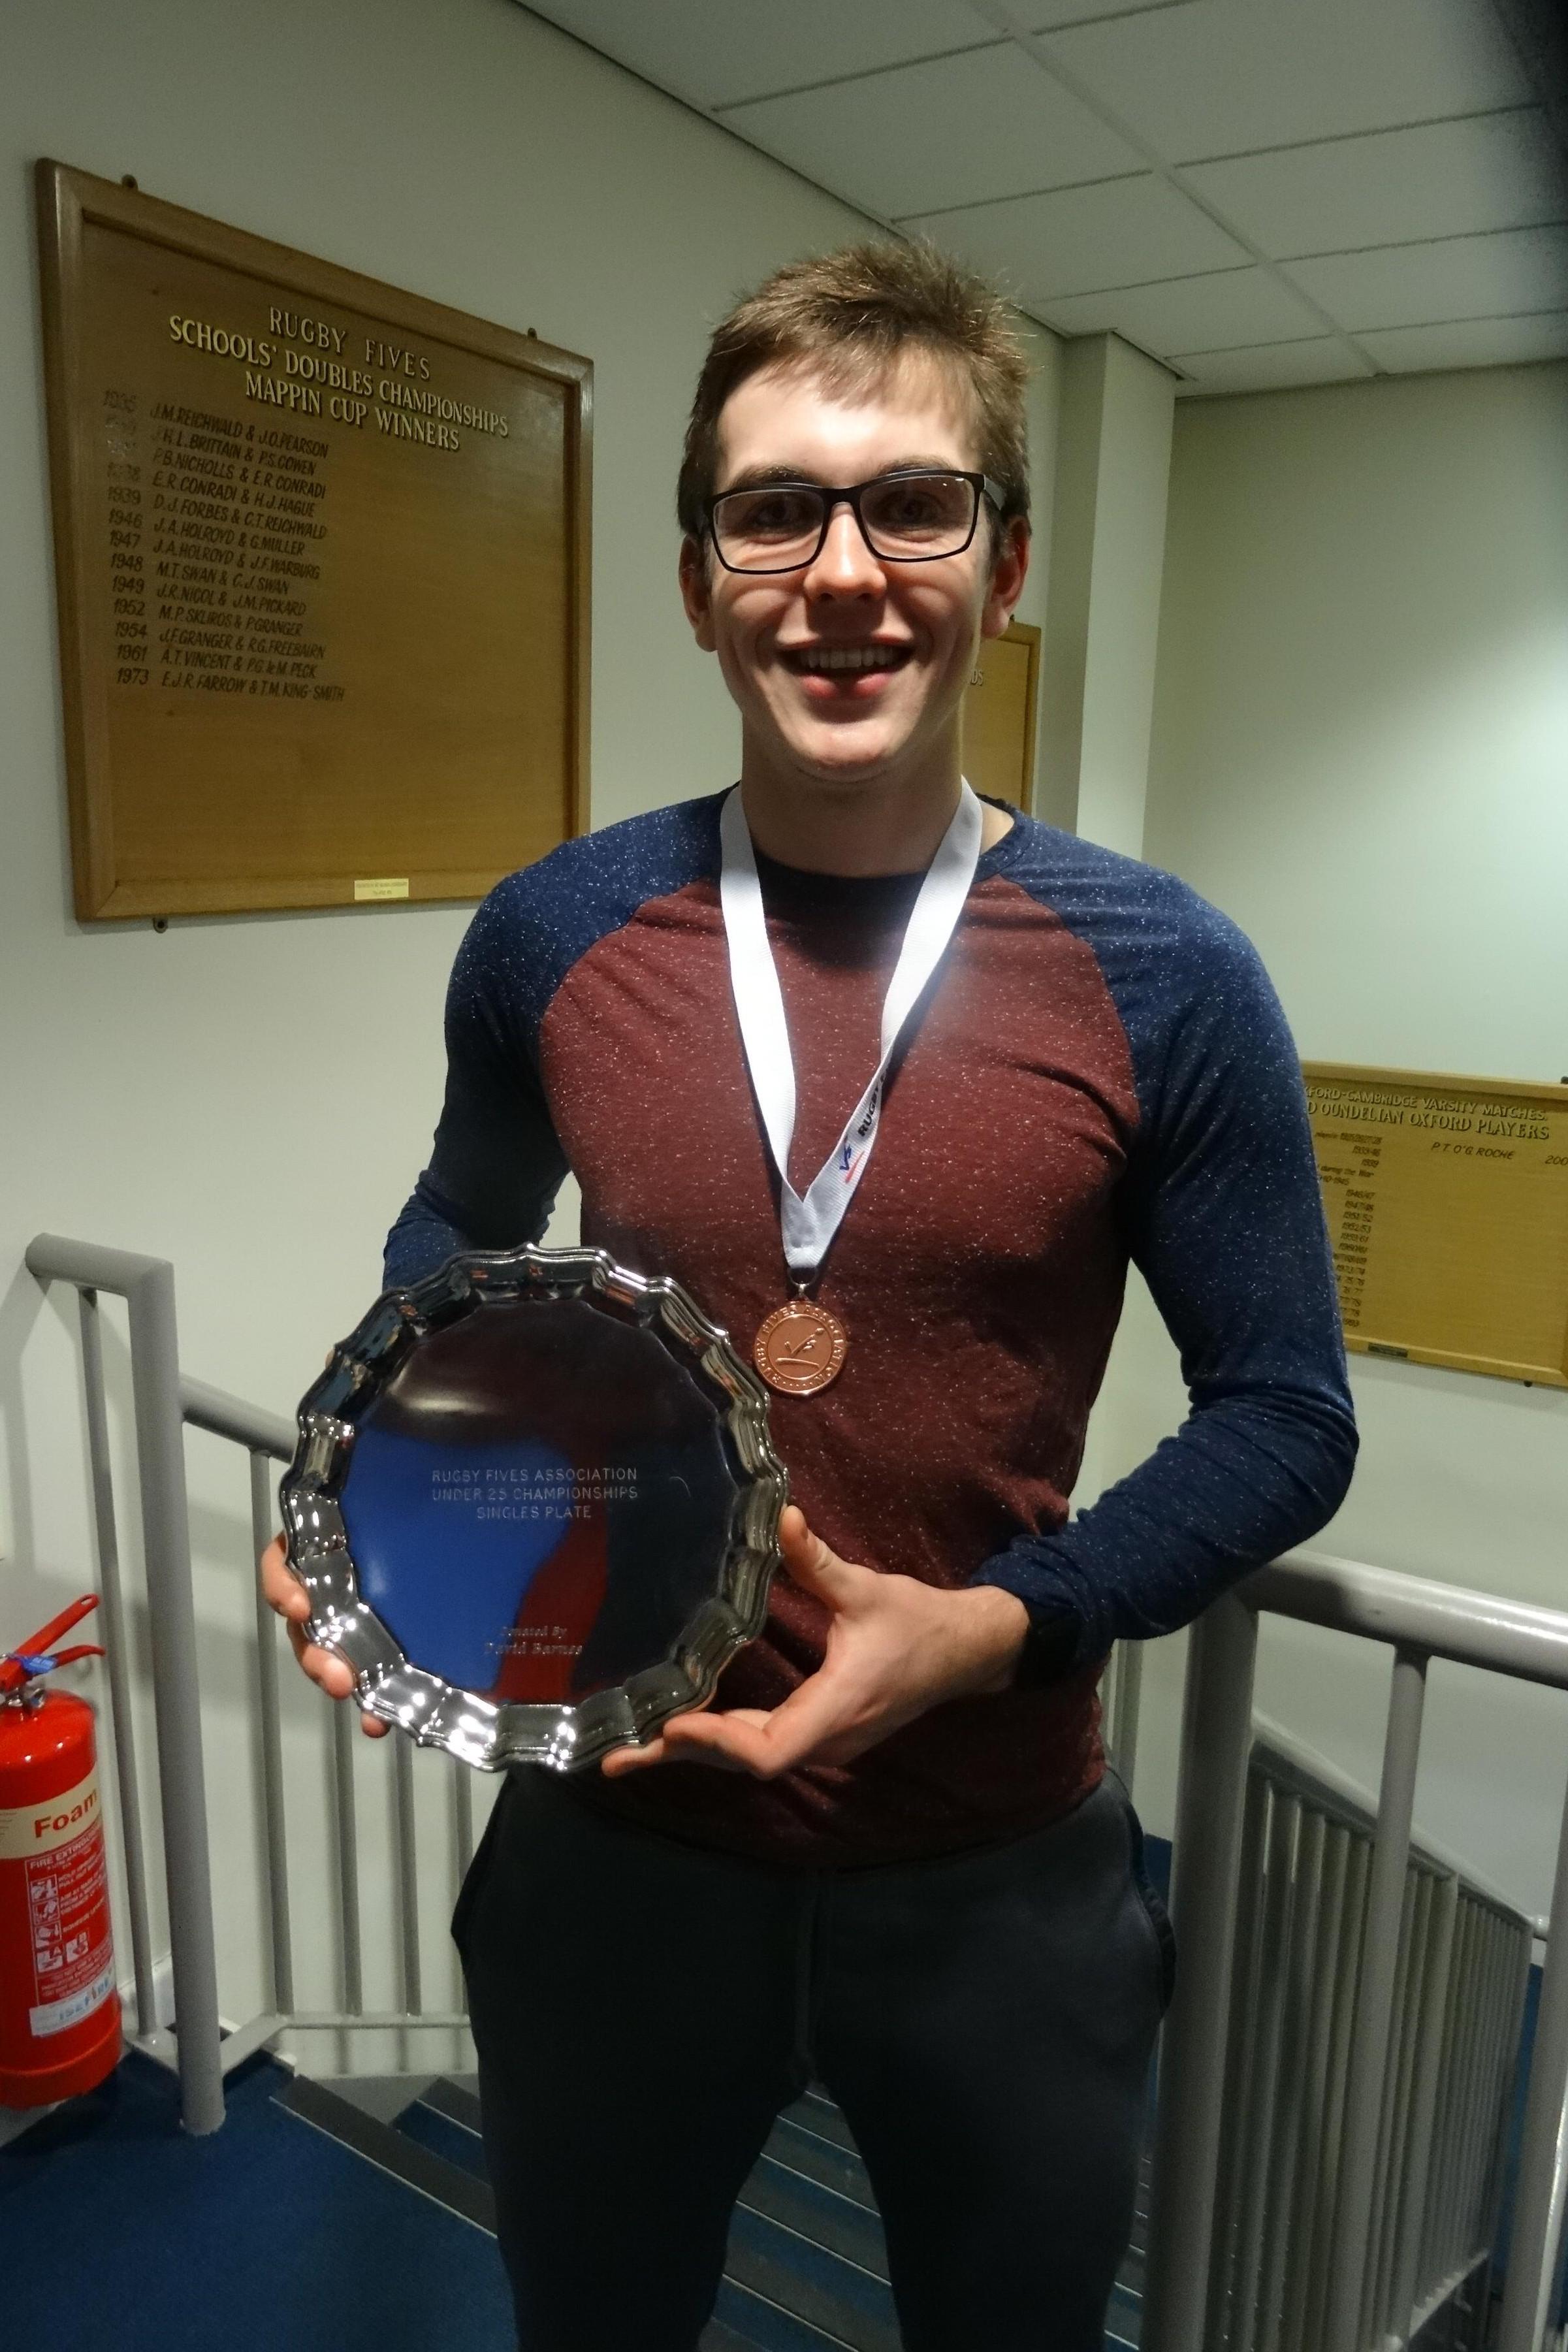 Singles Plate winner Tom Watkinson